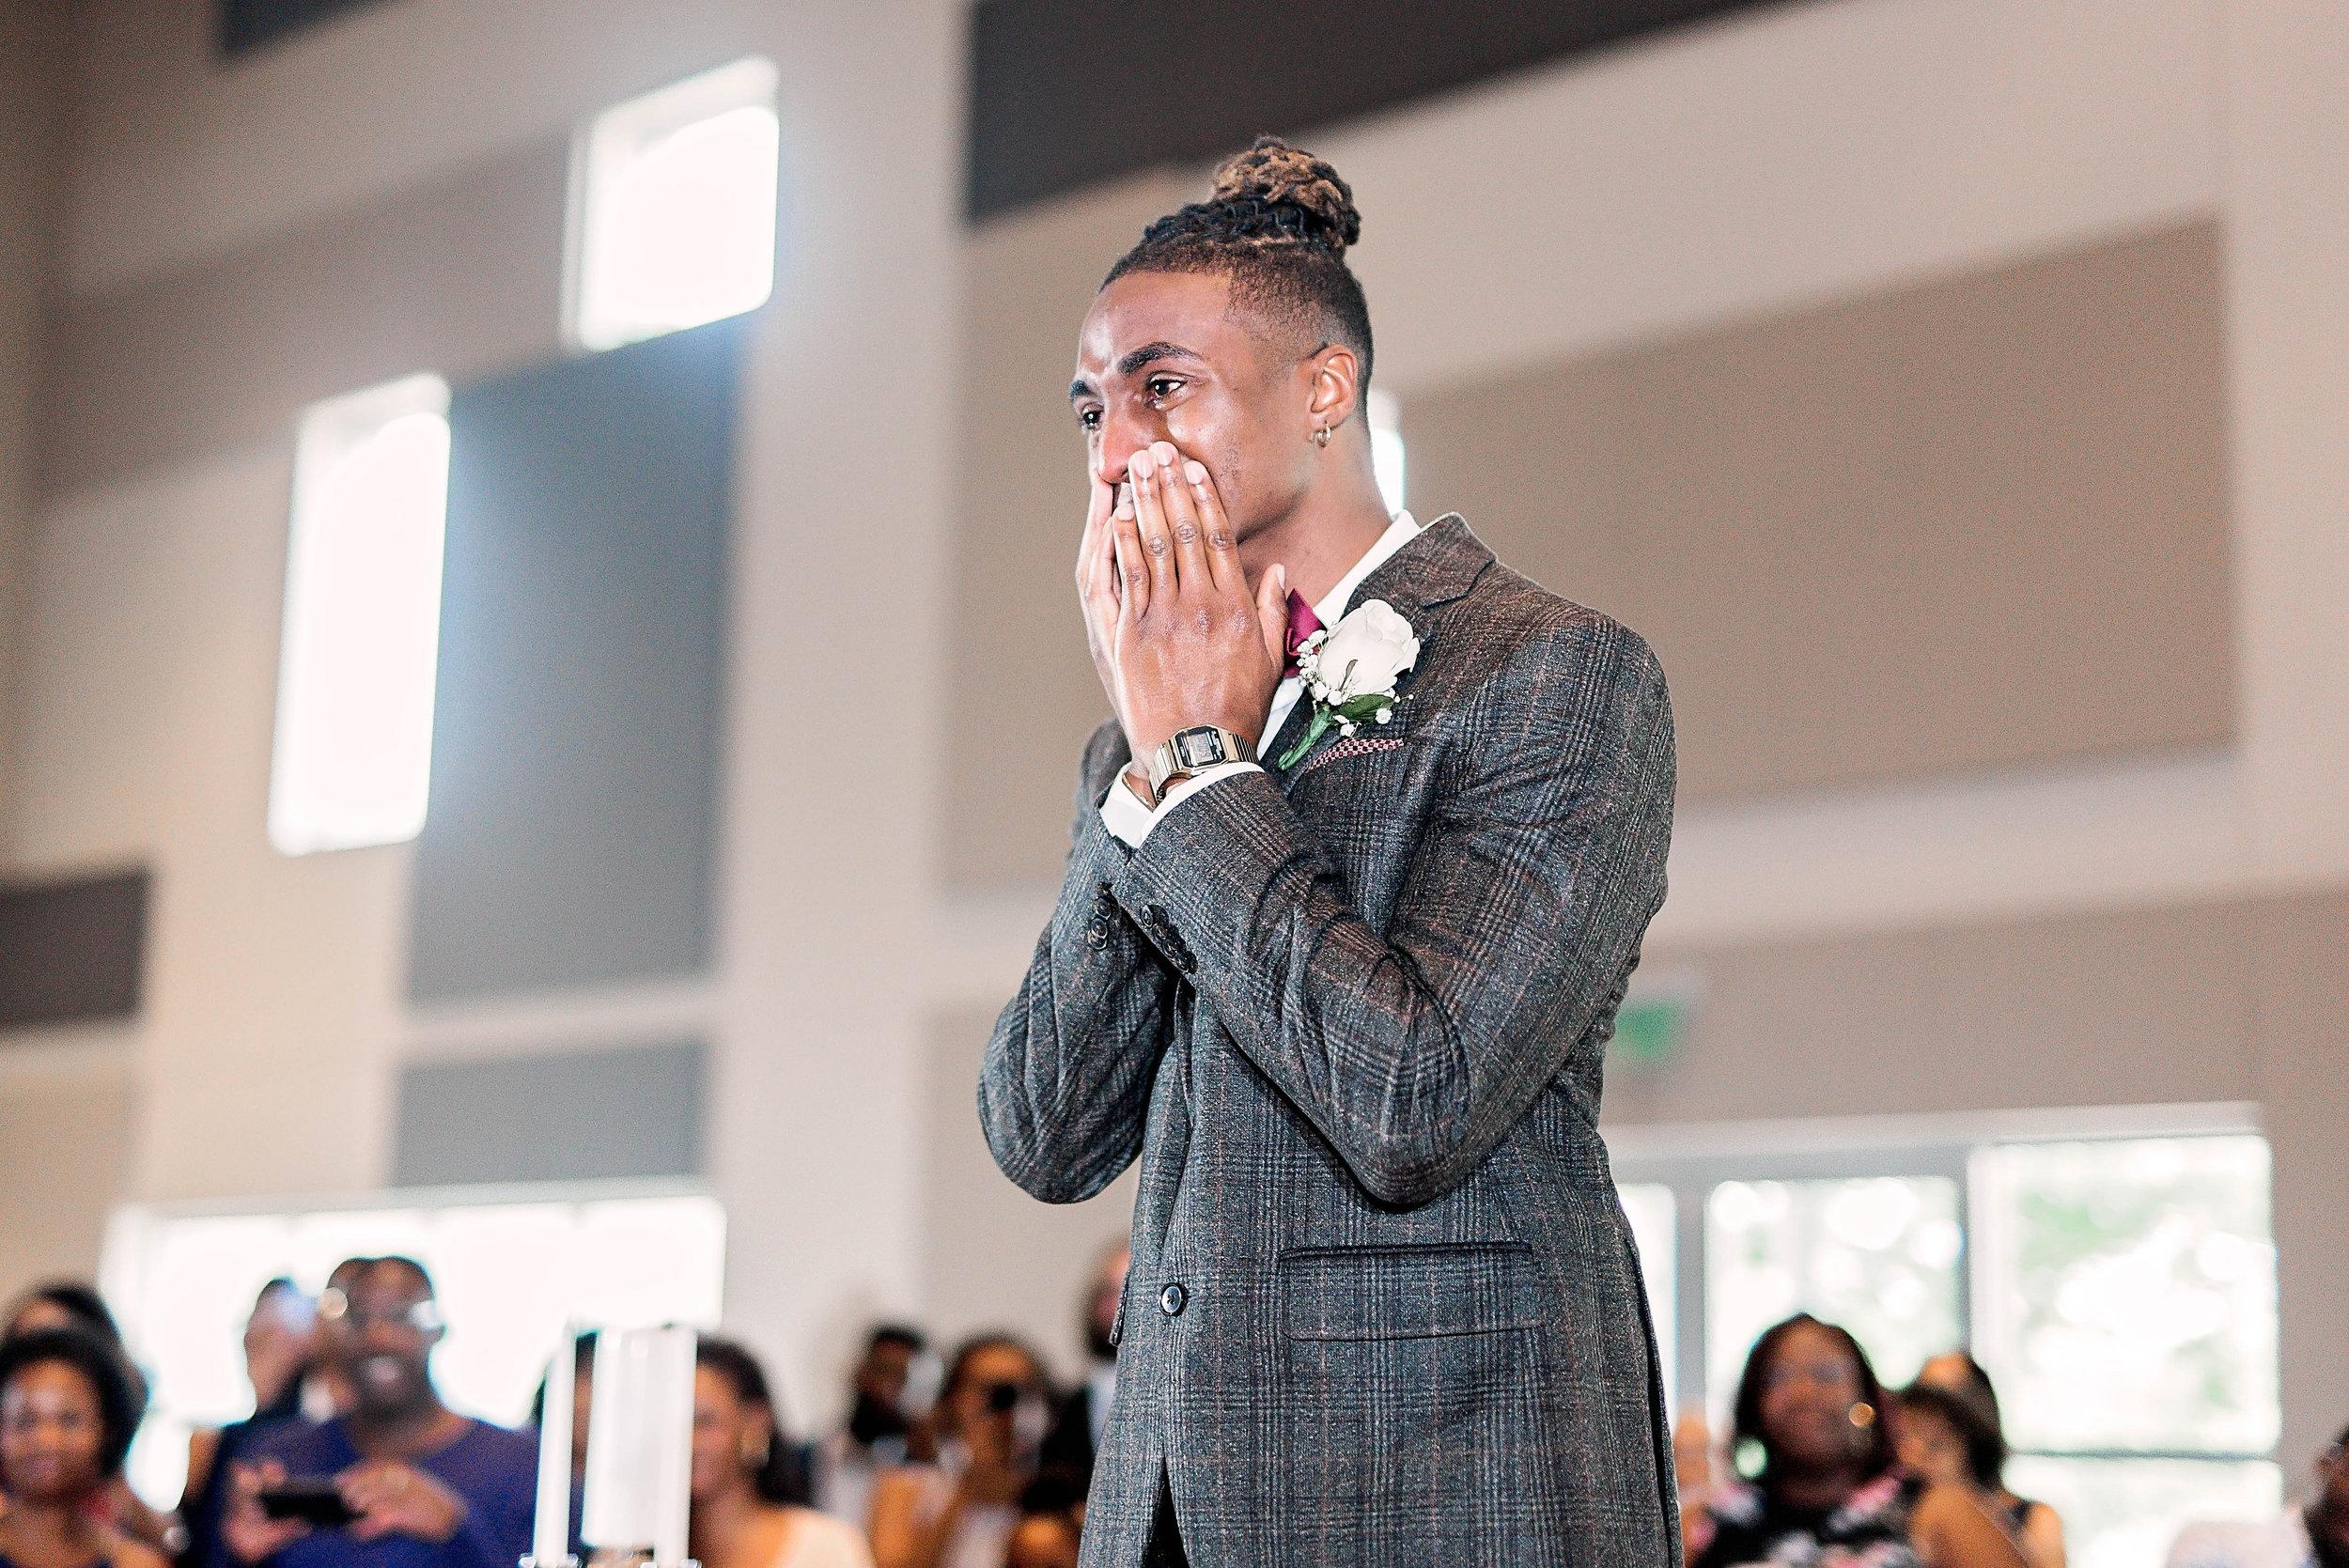 Dallas Wedding- Pharris Photography- Ceremony- Kaimyn + Ezra- Groom